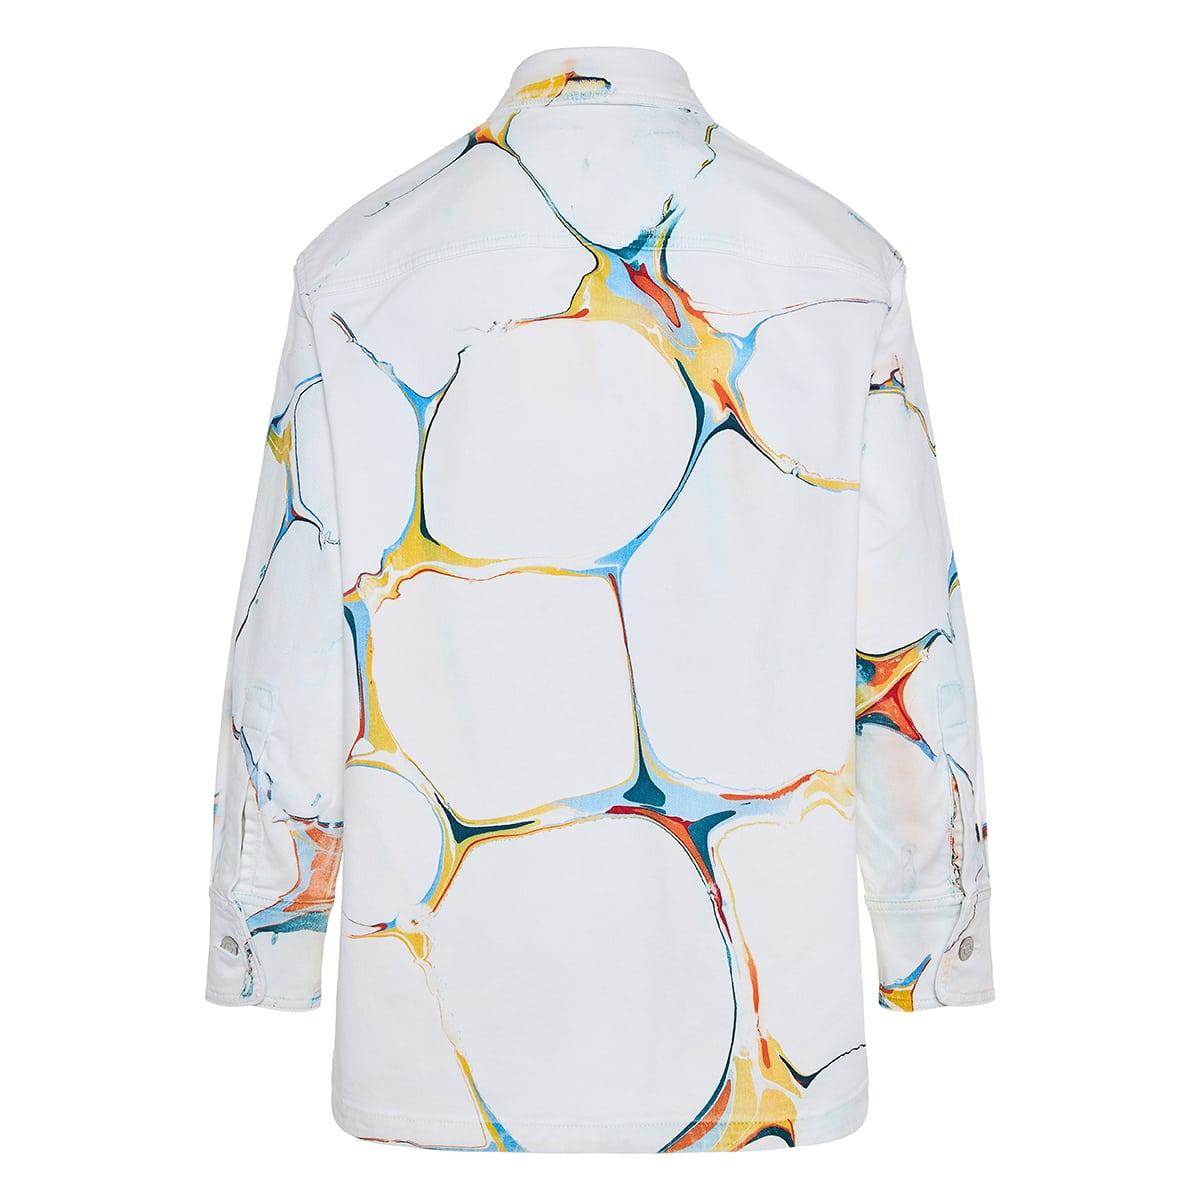 Printed denim overshirt